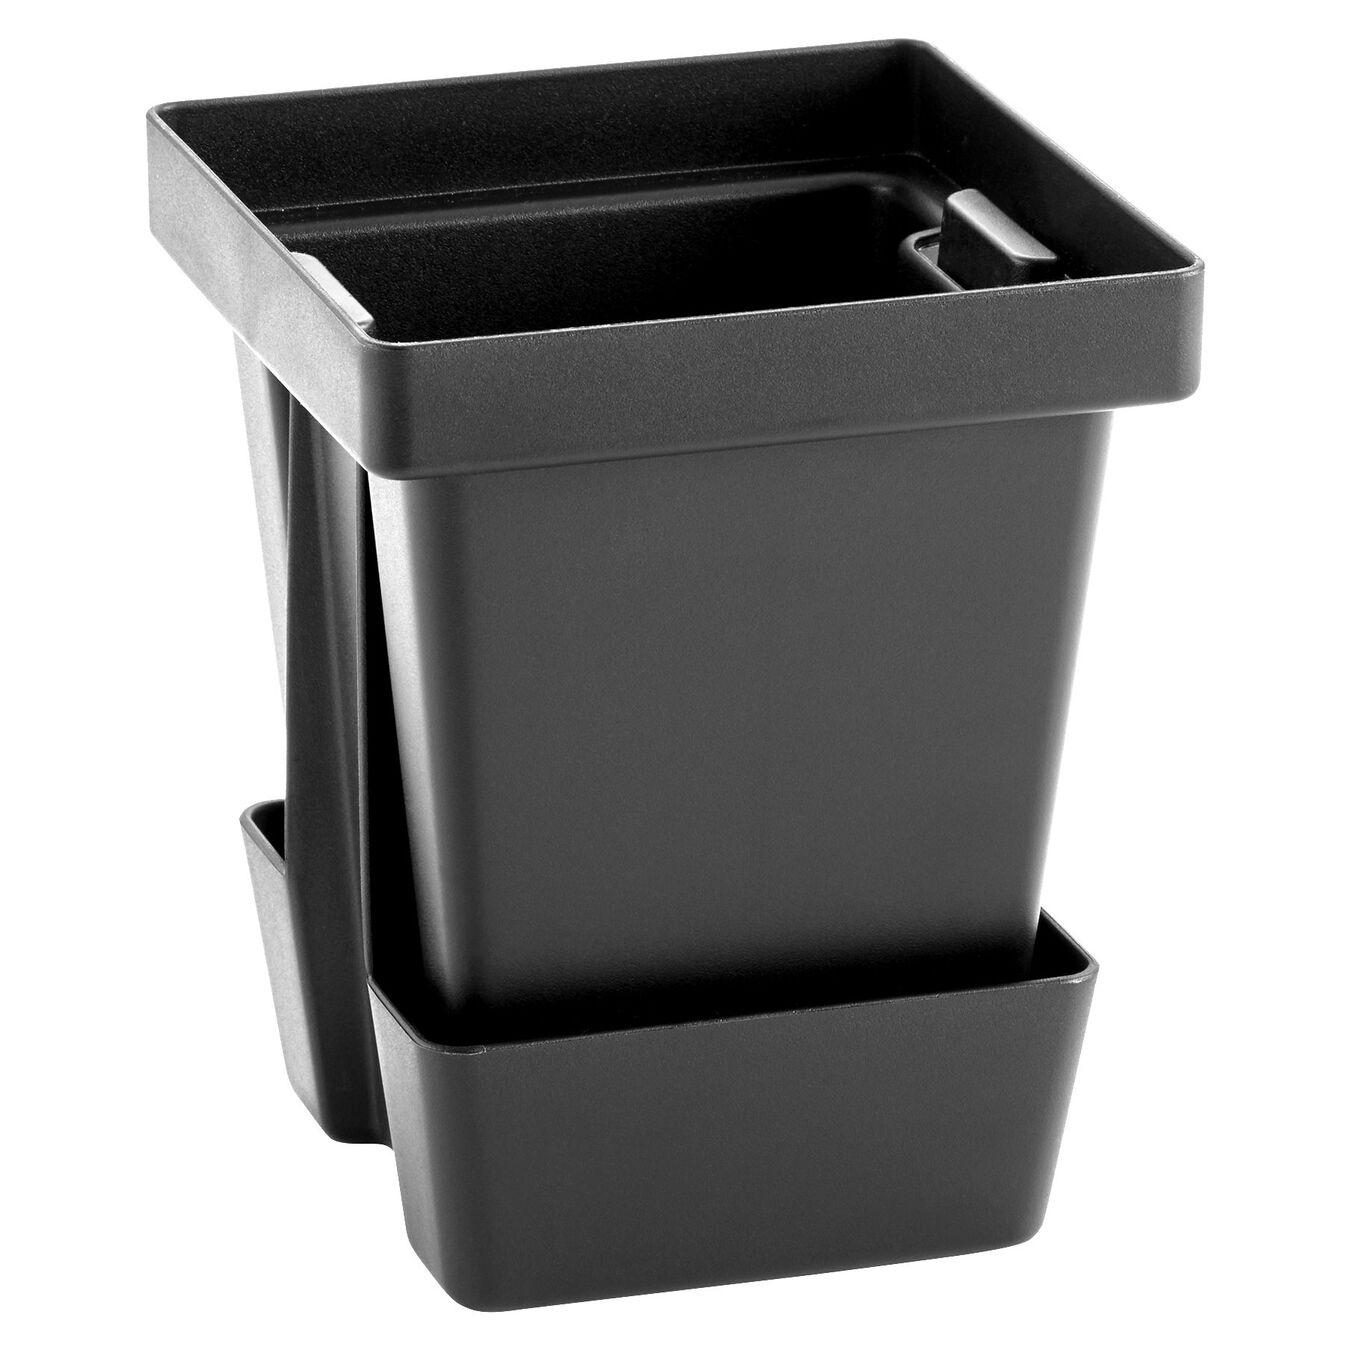 Aufbewahrungsgefäß Set, 4-tlg | Keramik,,large 4